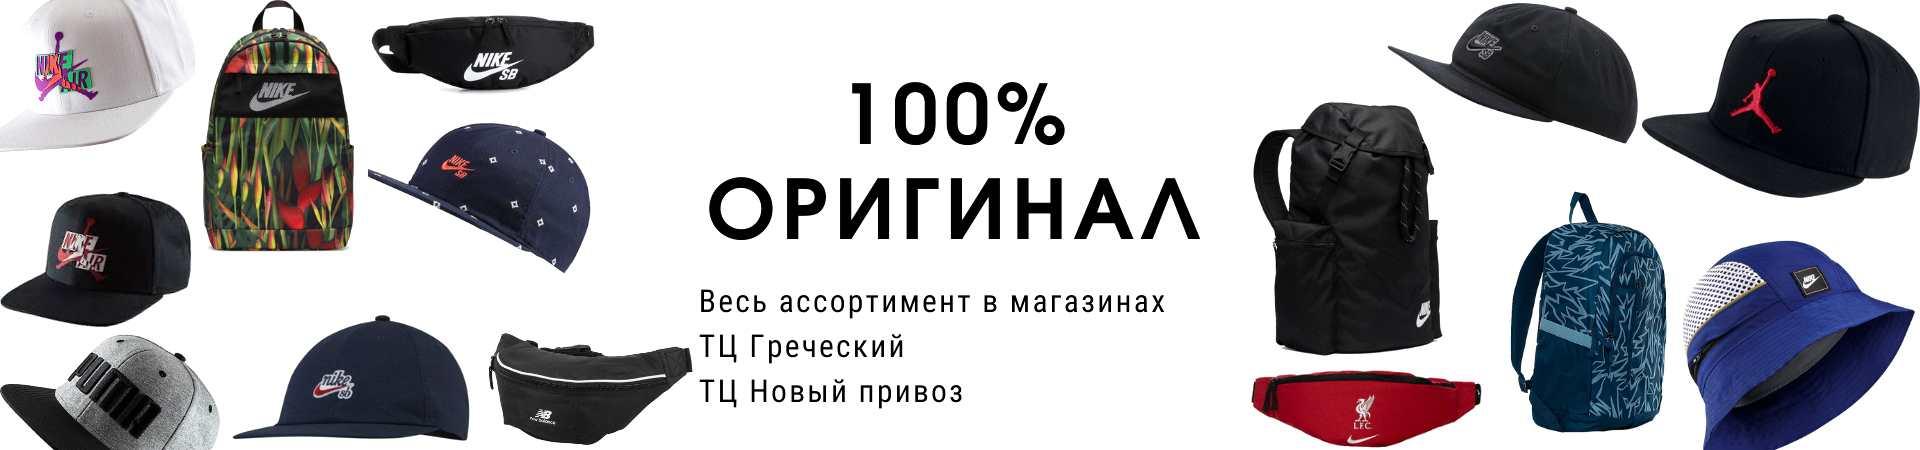 kepki-sumki-nike-original-odessa-shopchik